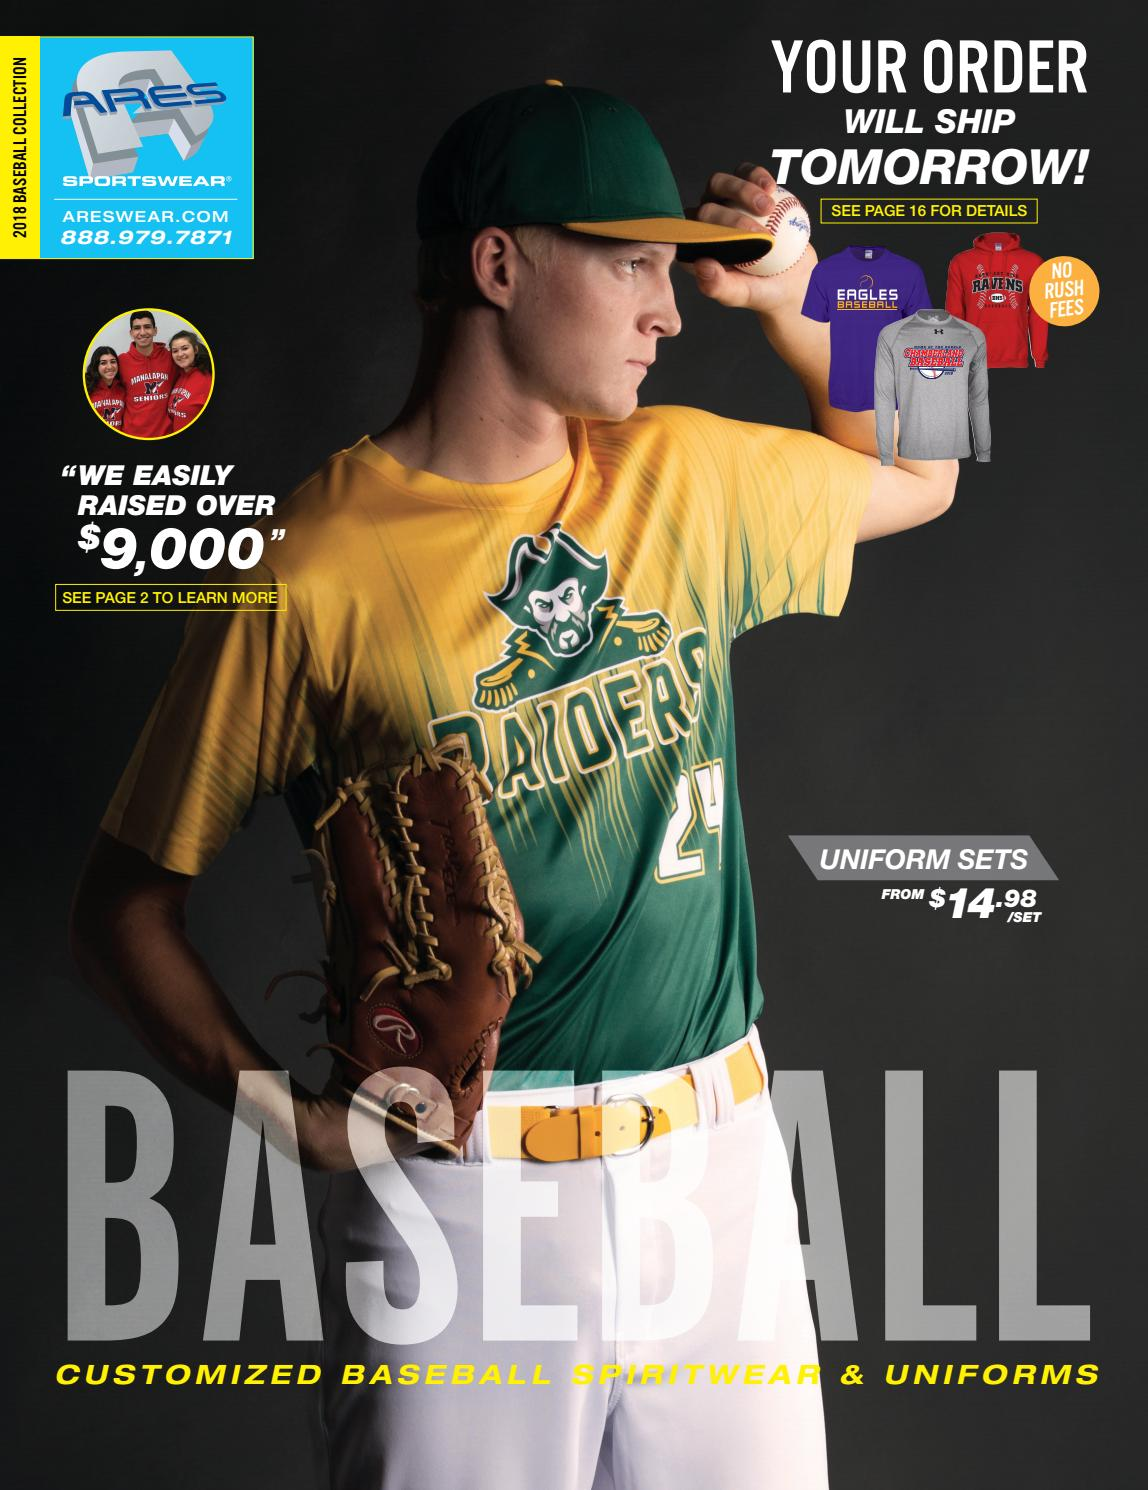 0e352552 2018 Ares Sportswear Baseball Catalog by Ares Sportswear - issuu